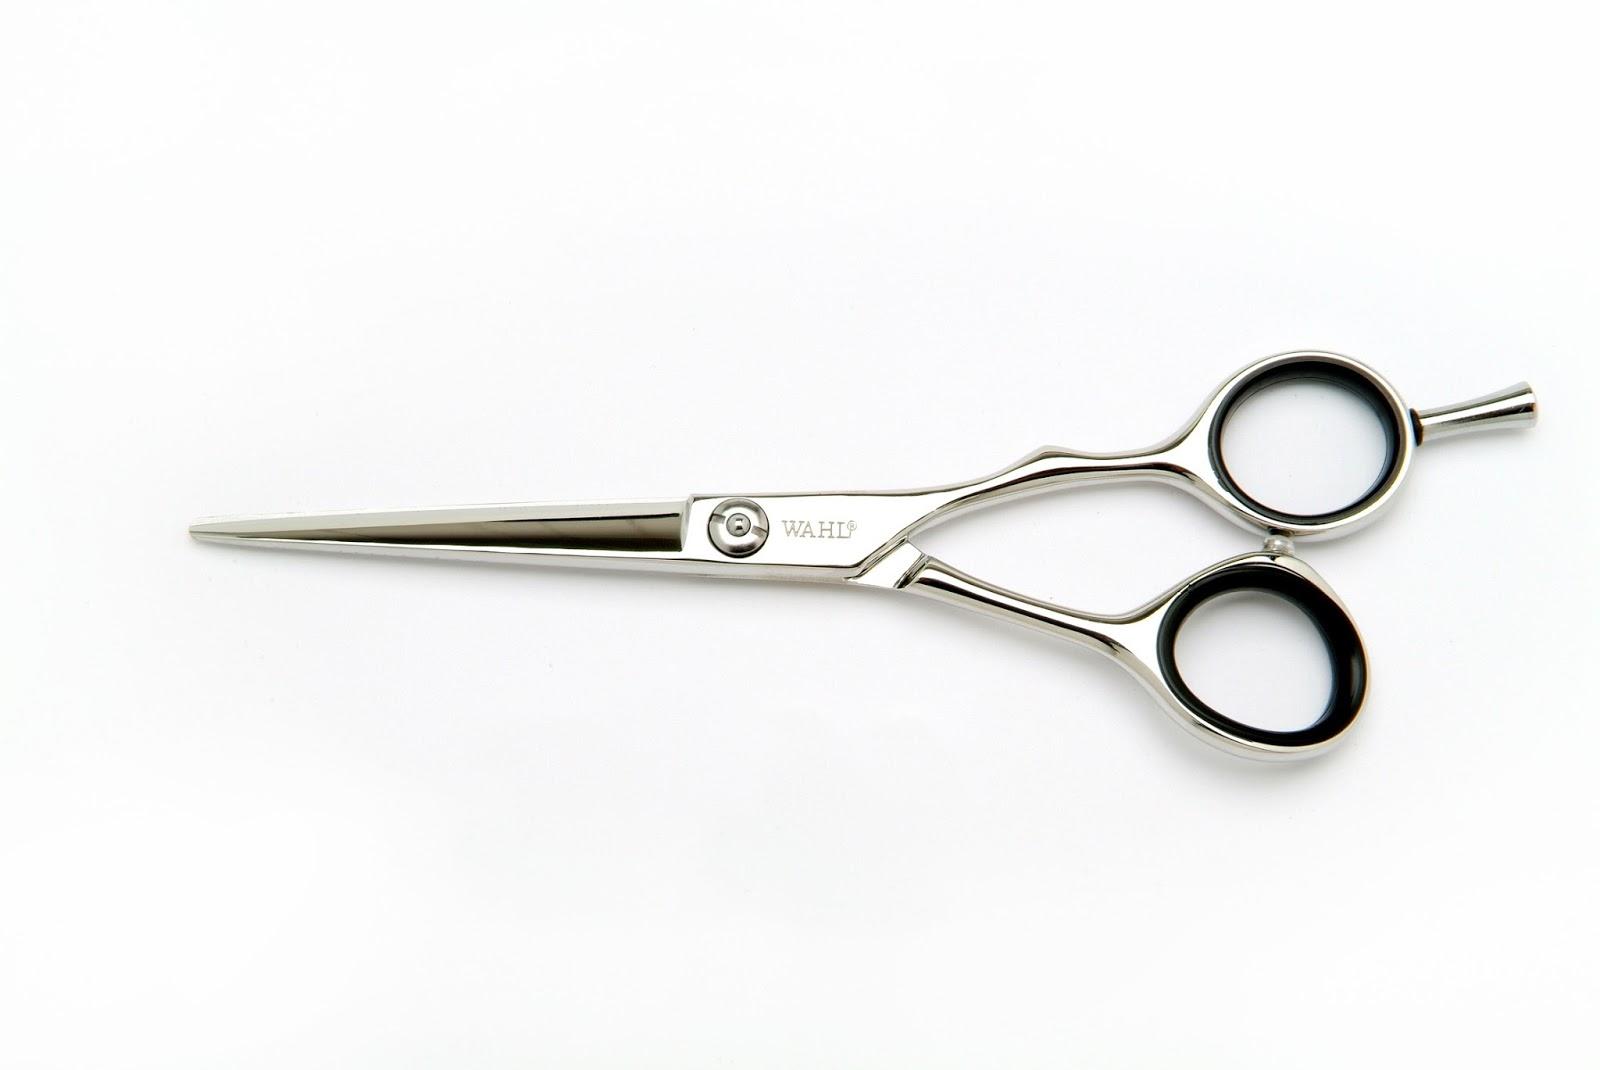 Jual Gunting Potong Rambut Untuk Usaha Pangkas Rambut